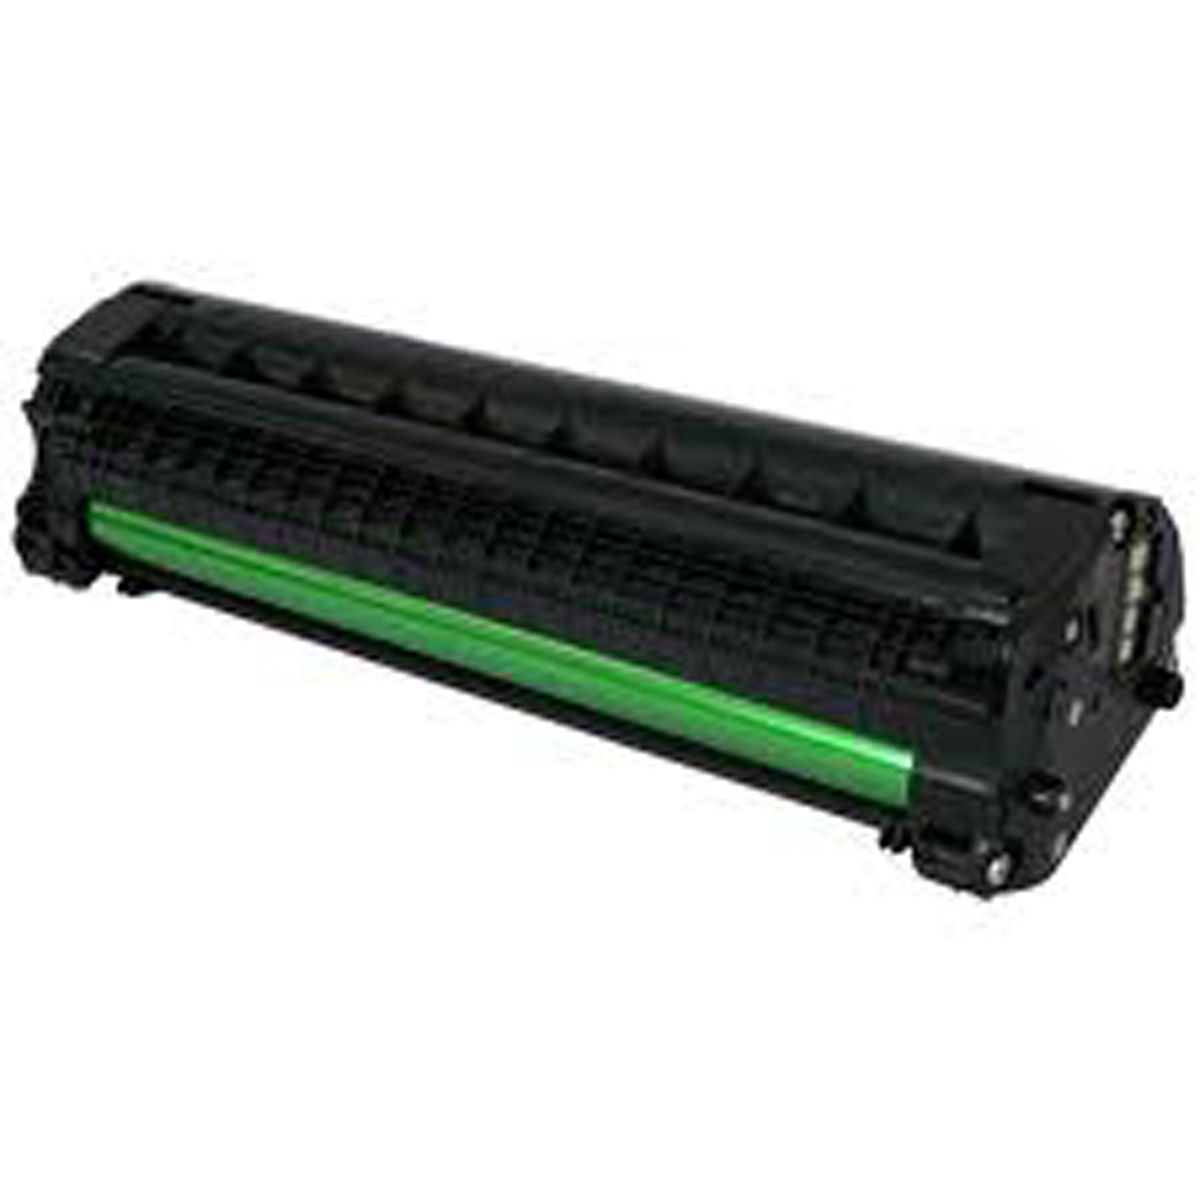 Toner Samsung D104S D104 104 - ML1665 ML1660 SCX3200 SCX3217 SCX3205 - Compativel B076CS7VWW